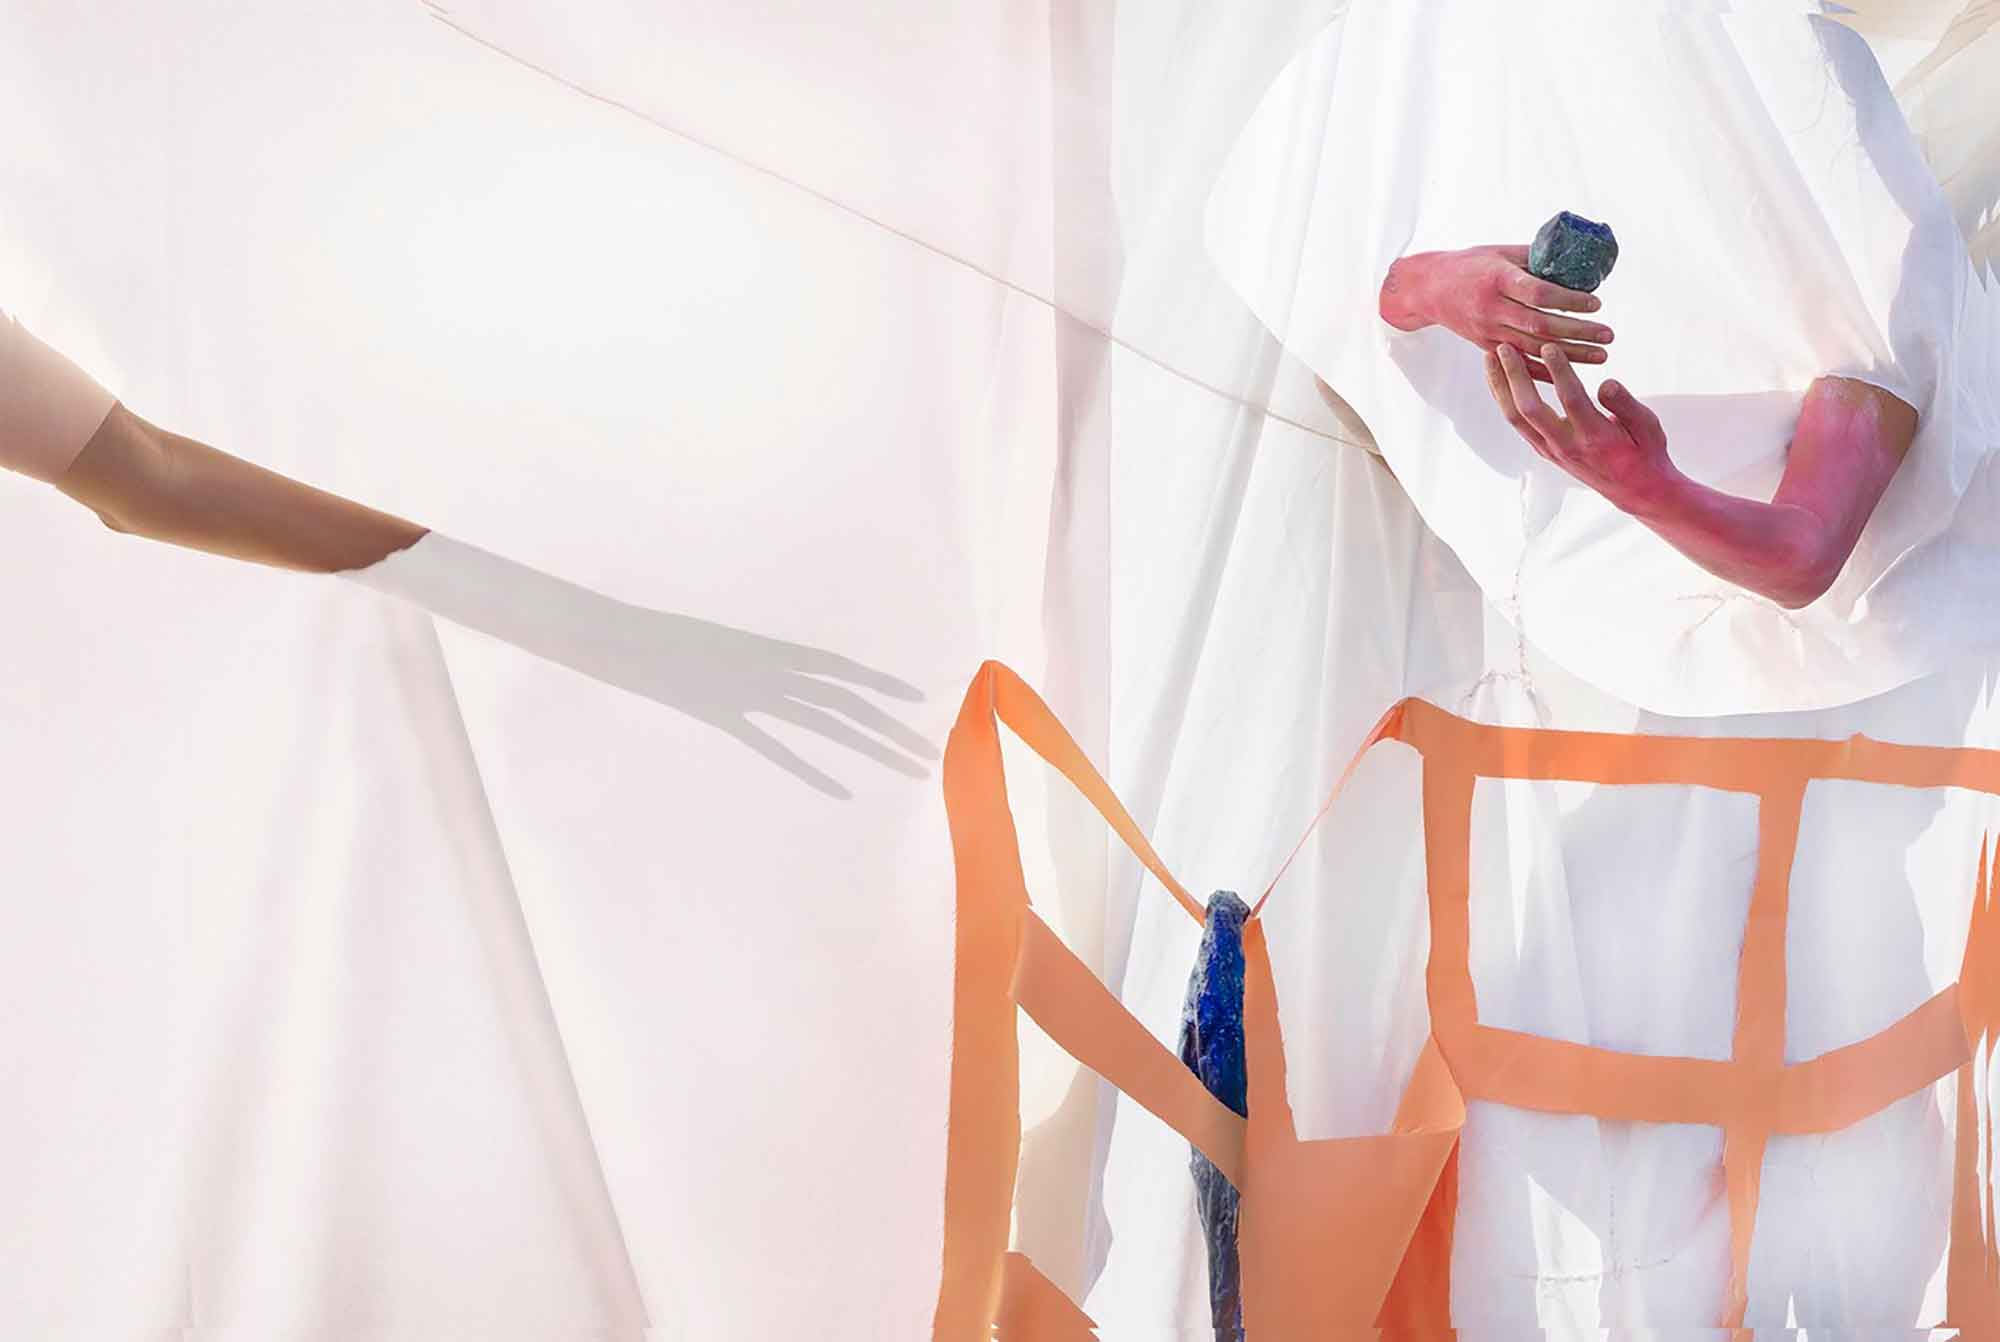 Brianna Speight, Where the snakes hang, 2019, 73 x 110cm, giclee print. Photograph: Brianna Speight.